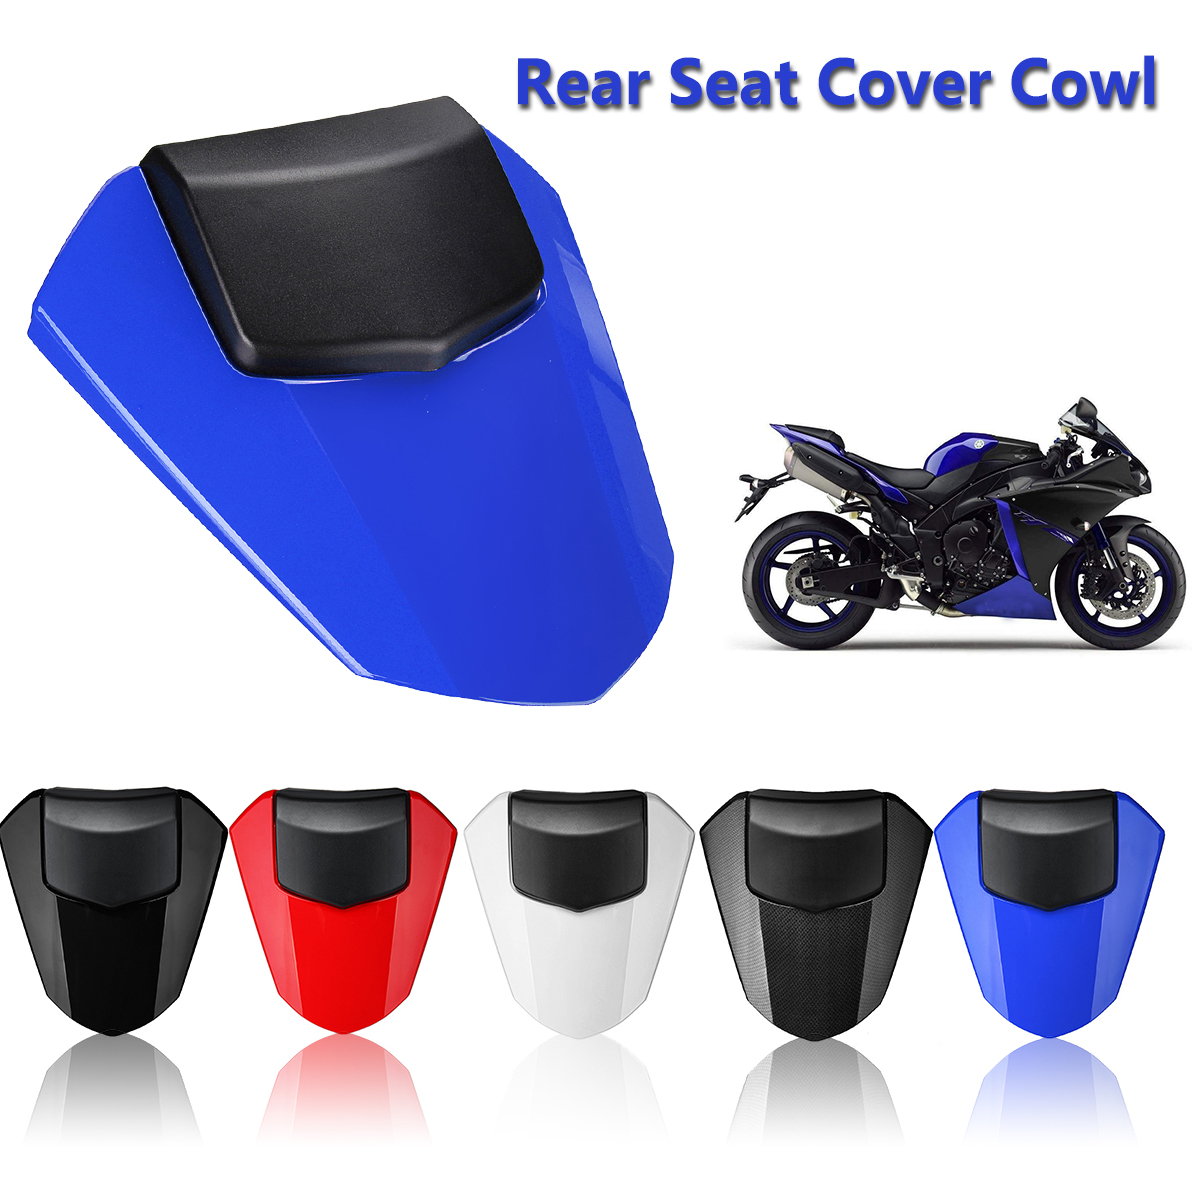 Blue GZYF Rear Seat Fairing Cover Cowl Fits Yamaha YZF R6 2008-2016